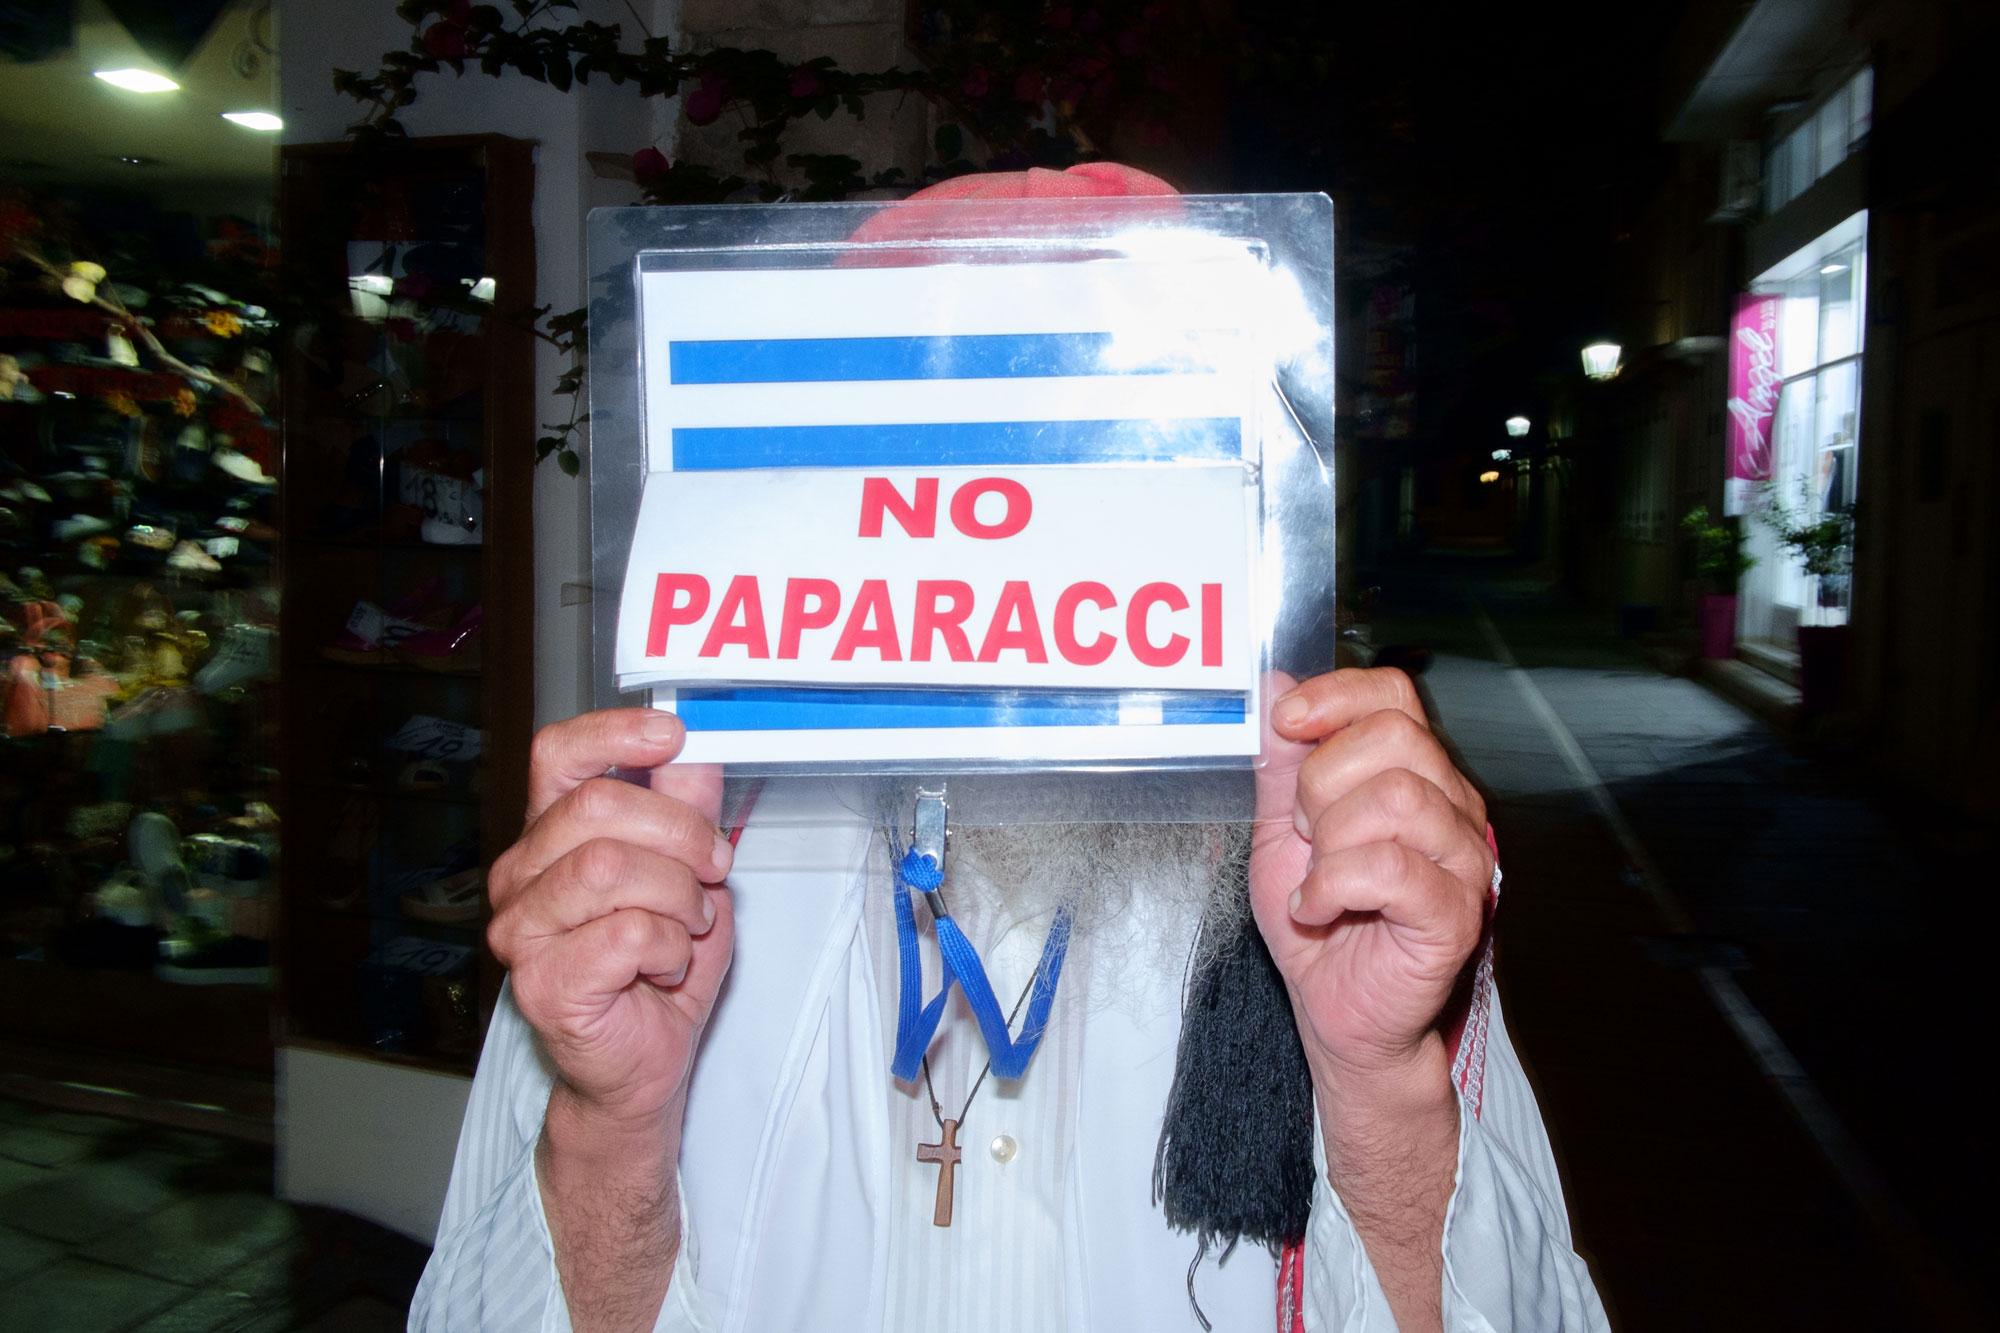 Rethymno---No-Paparacci